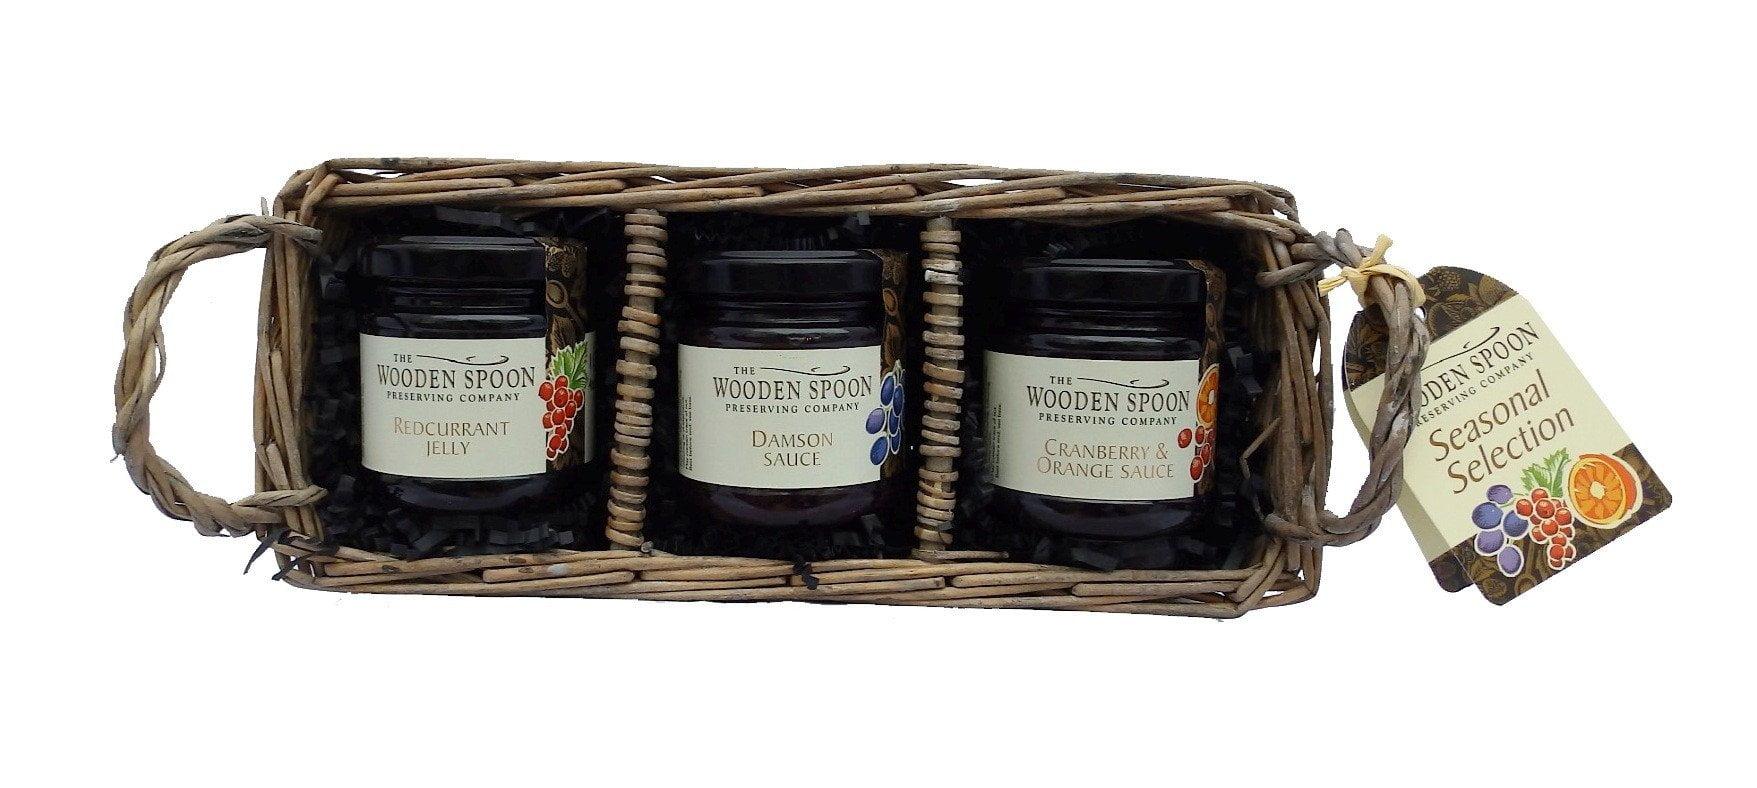 Seasonal Selection: Cranberry & Orange Sauce, Damson Sauce, Redcurrant Jelly  3 x 113g